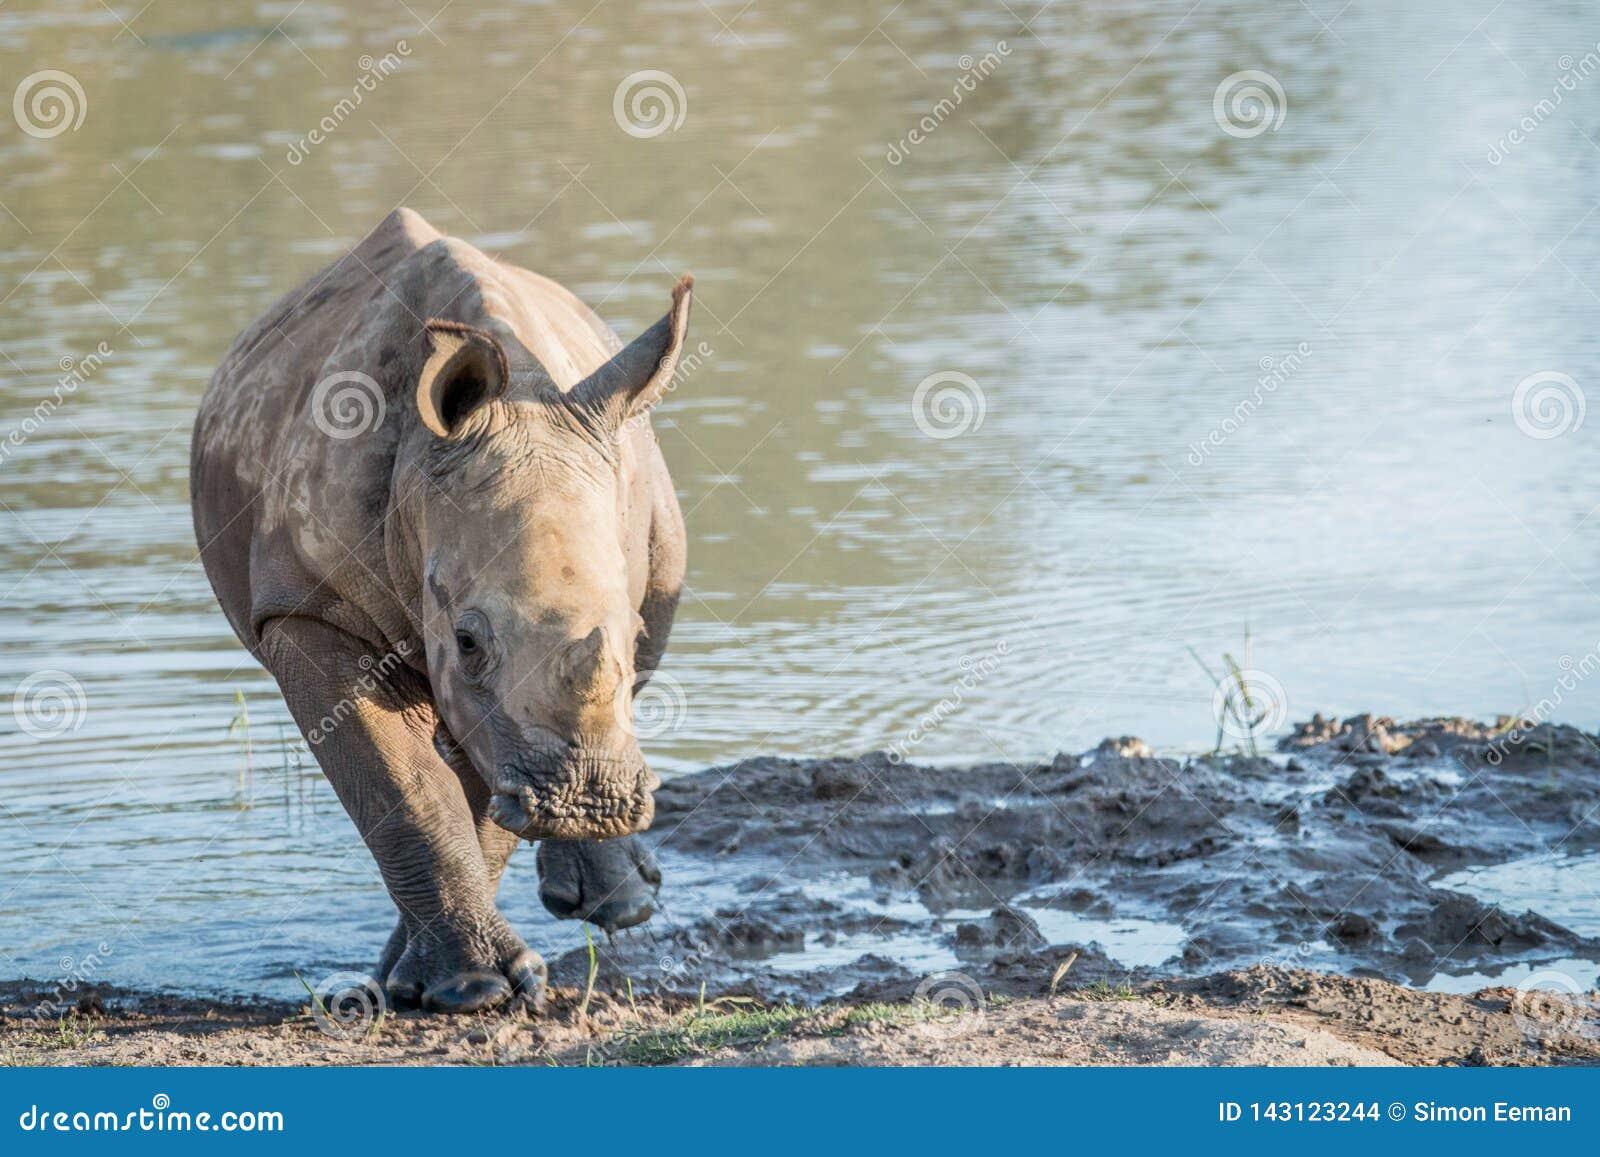 Baby White rhino calf playing in the water